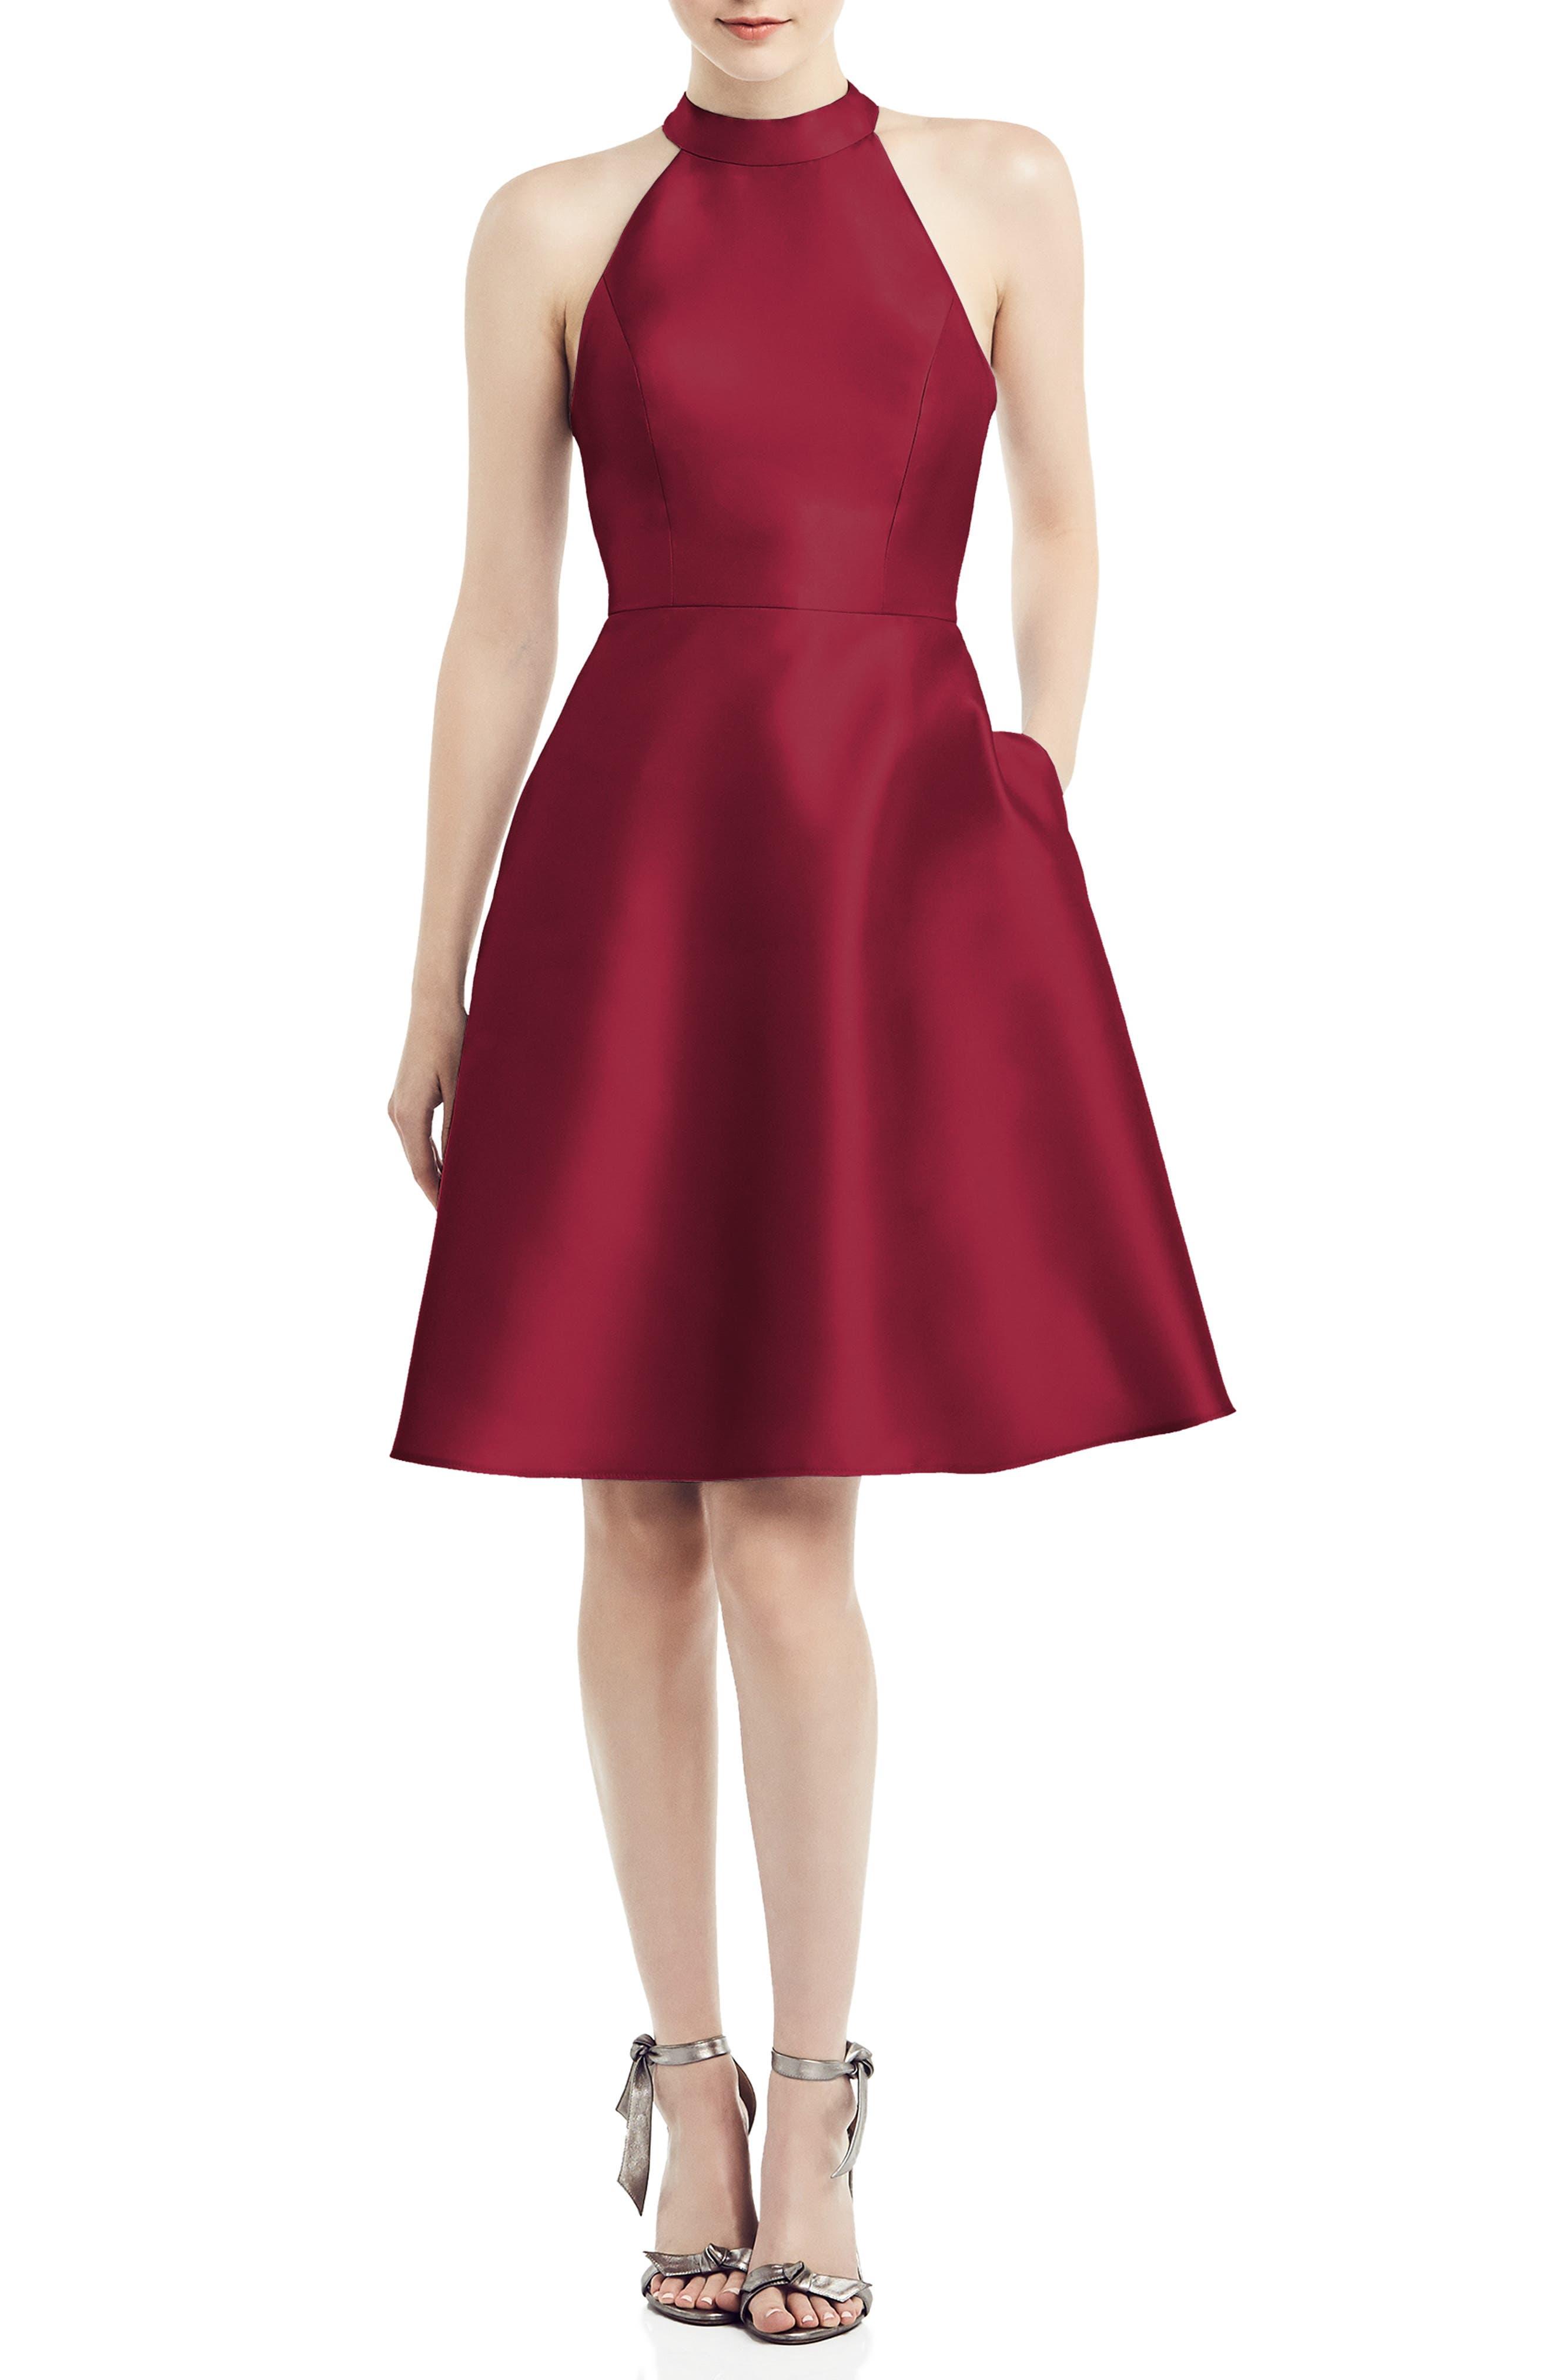 Halter Style Satin Twill Cocktail Dress